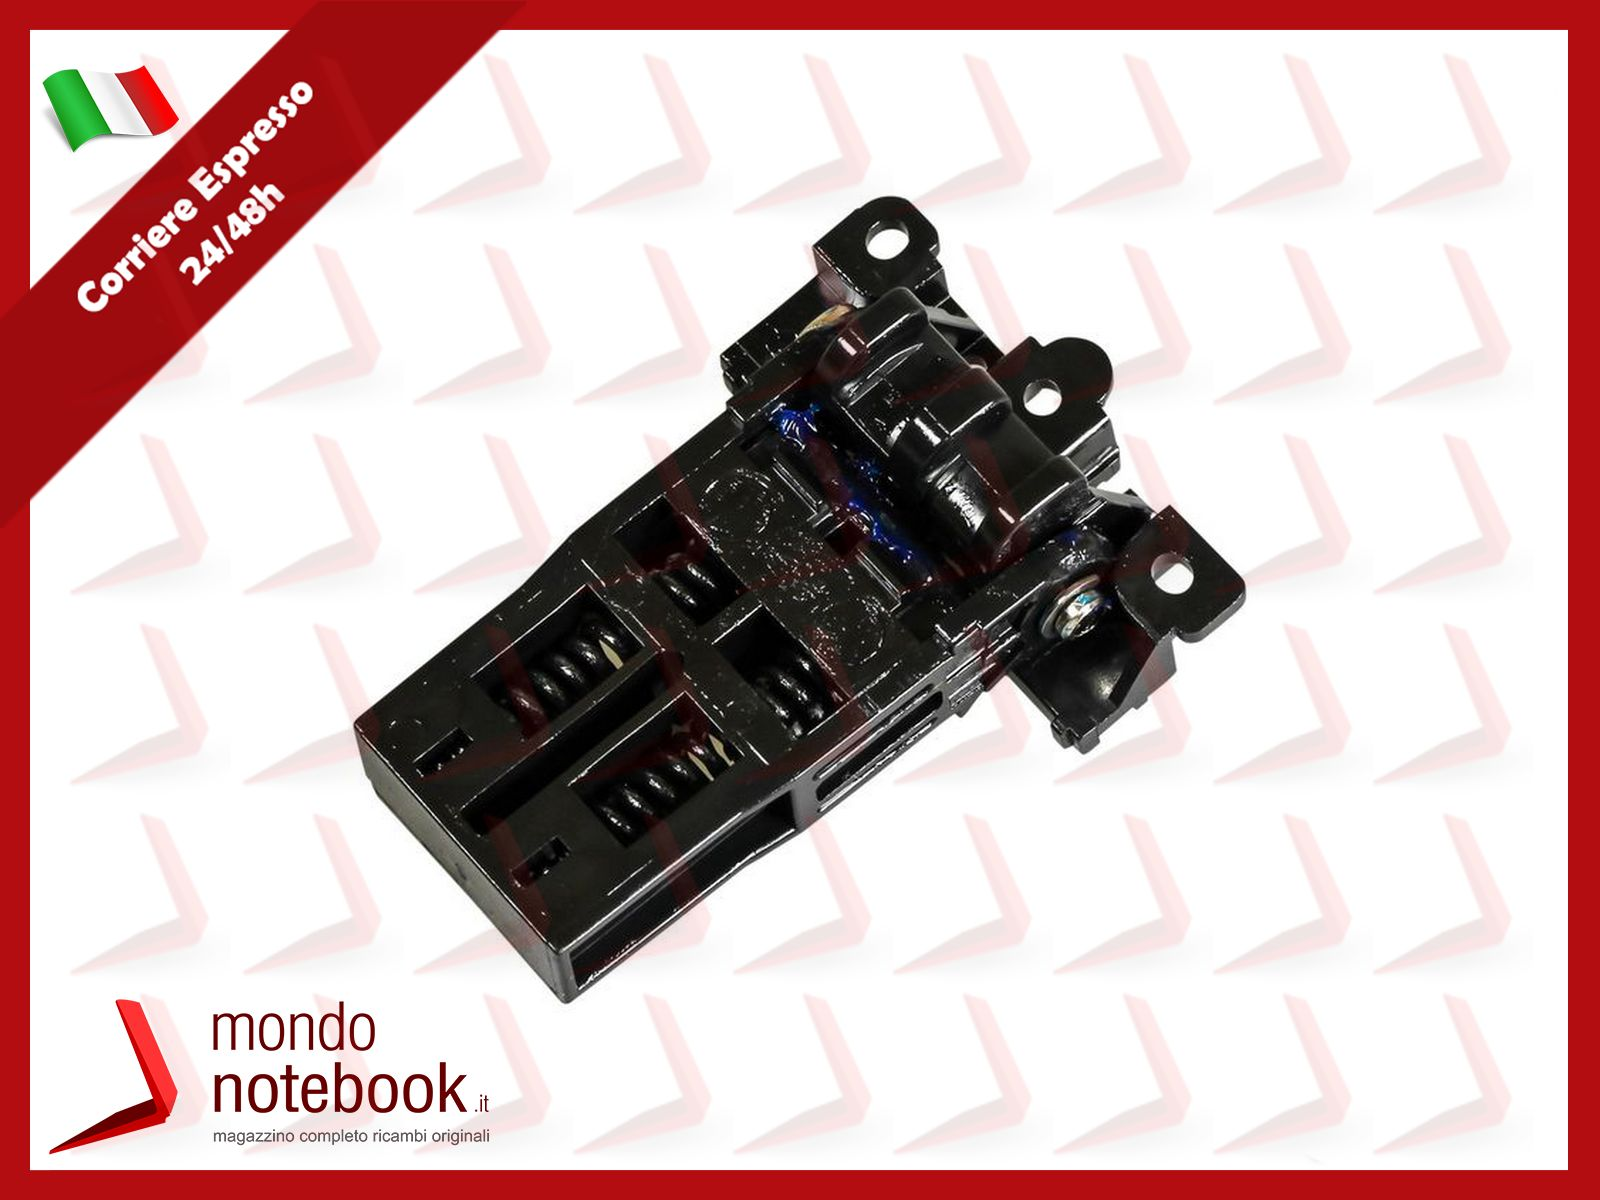 https://www.mondonotebook.it/10821/batteria-compatibile-alta-qualit-apple-iphone-4.jpg